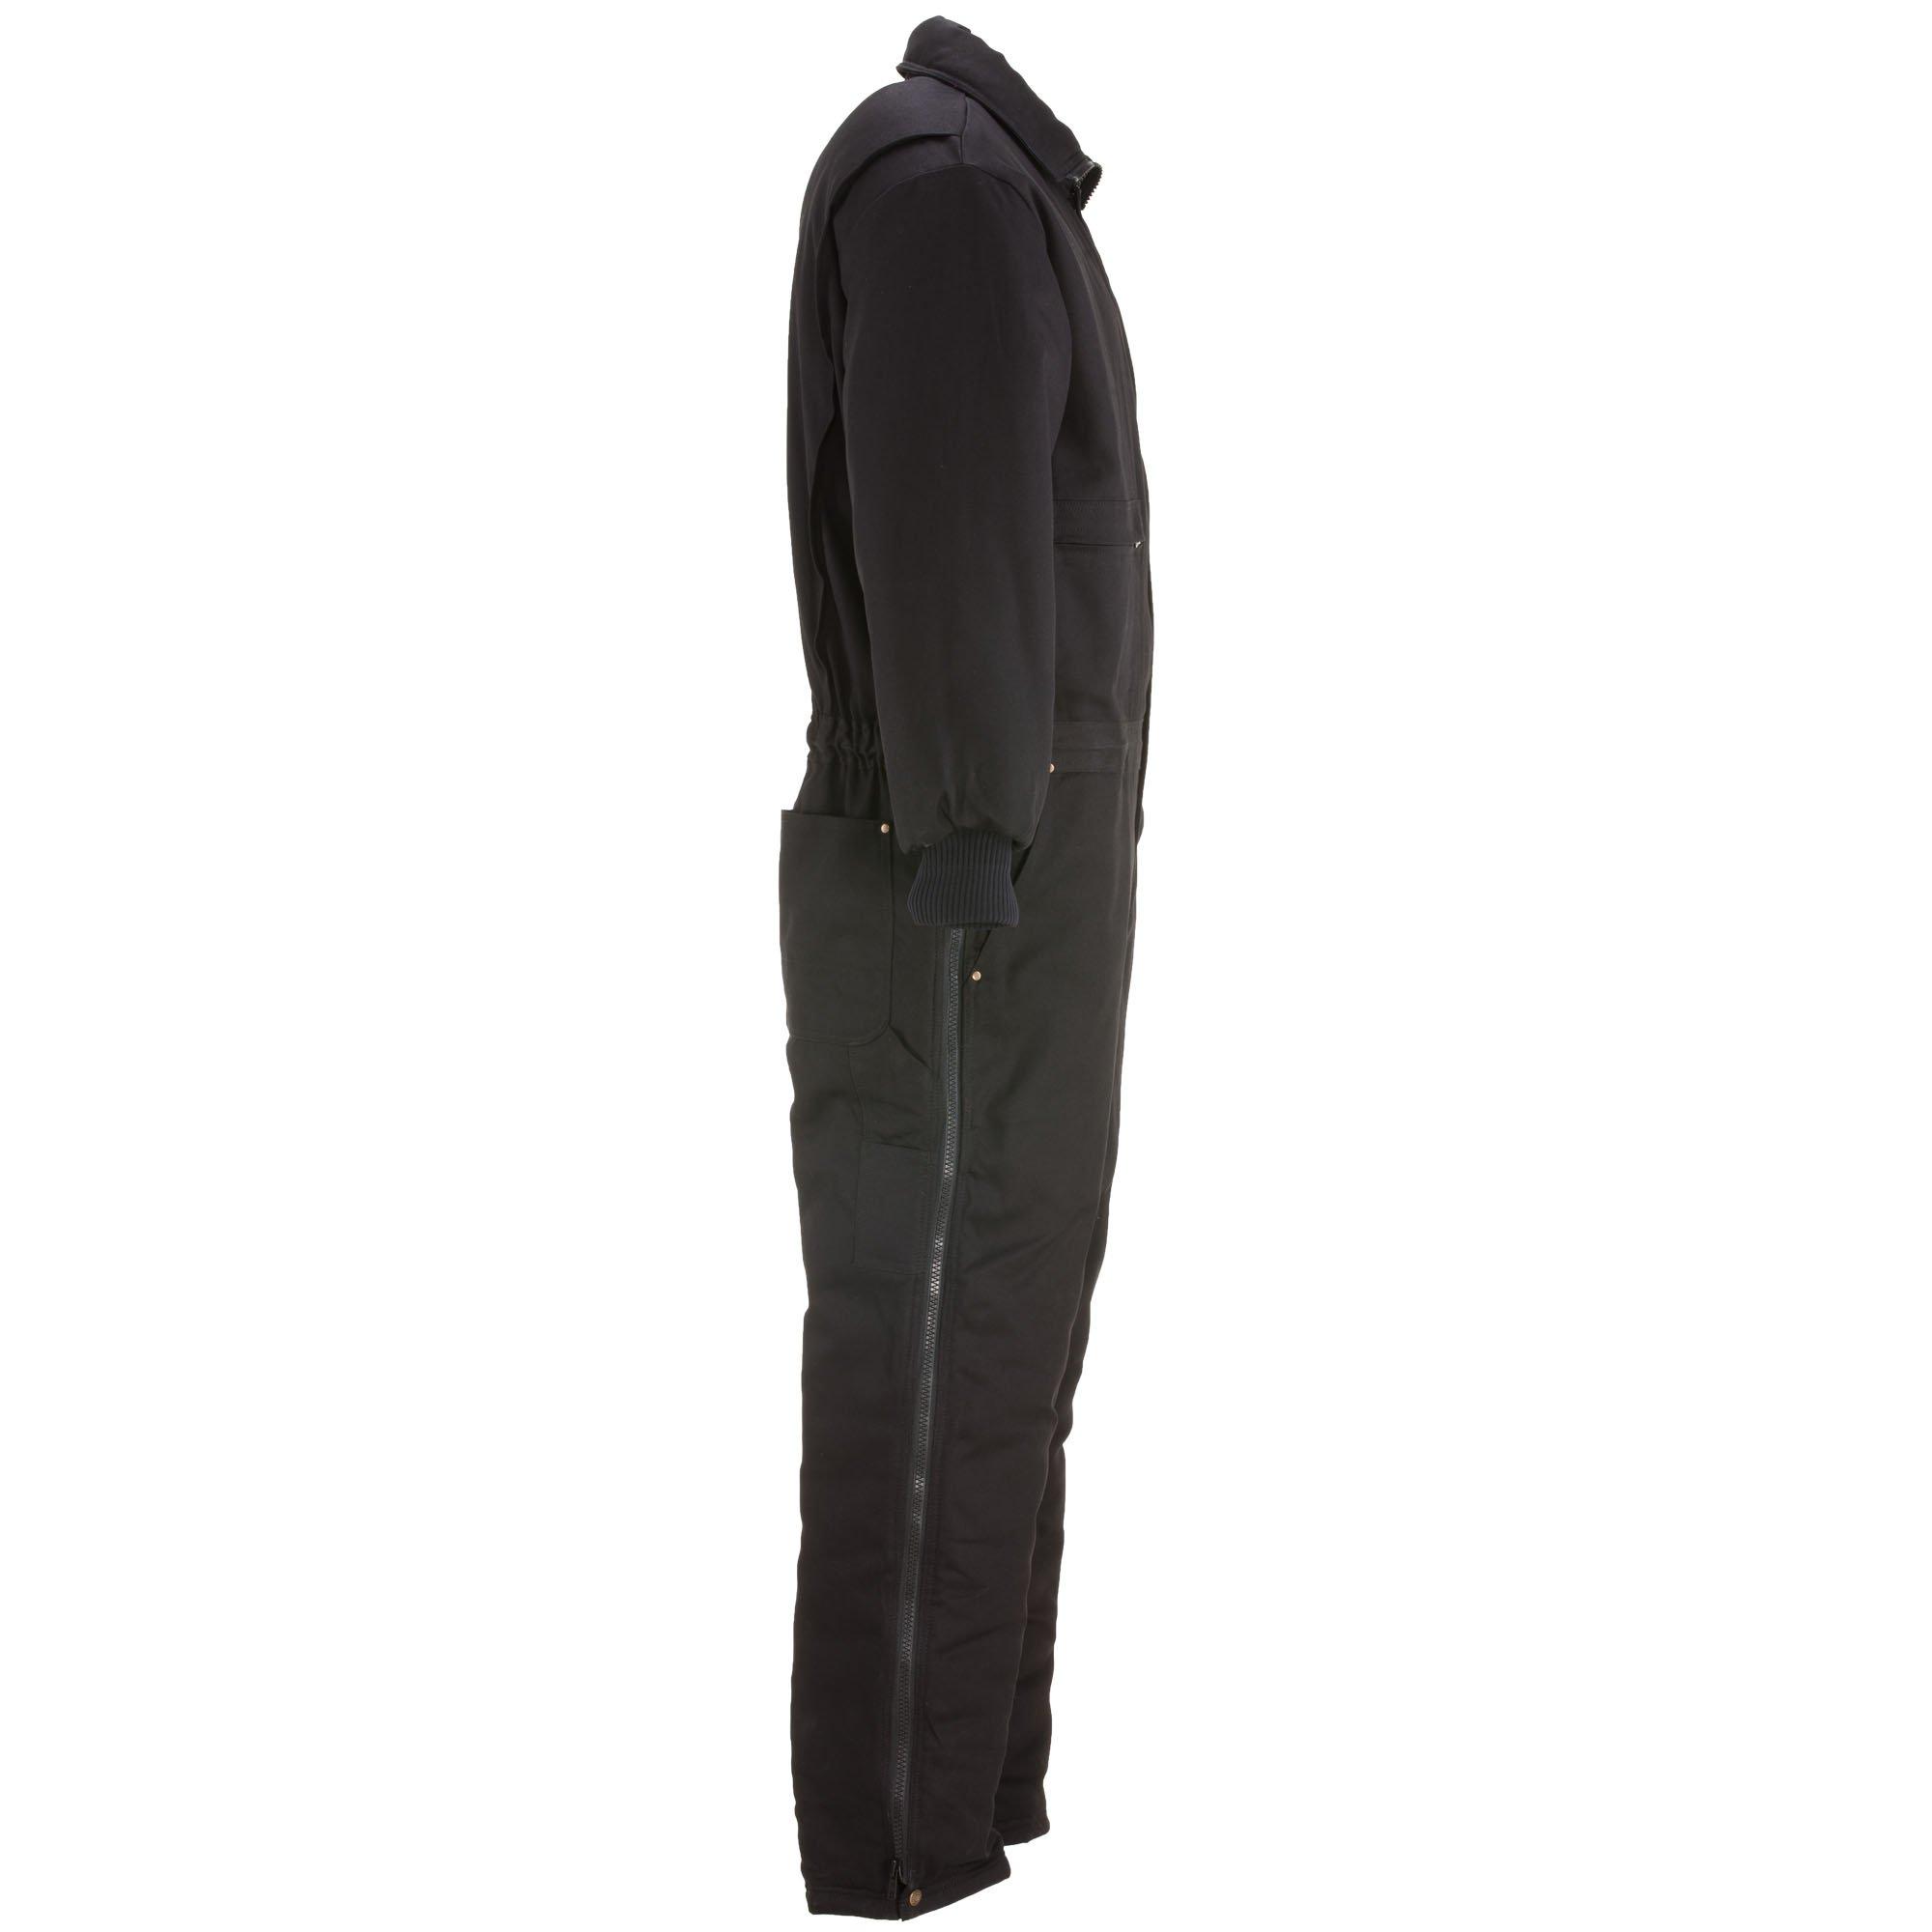 RefrigiWear Men's Water-Resistant Insulated Denim Comfortguard Coveralls (Black, XL) by RefrigiWear (Image #4)